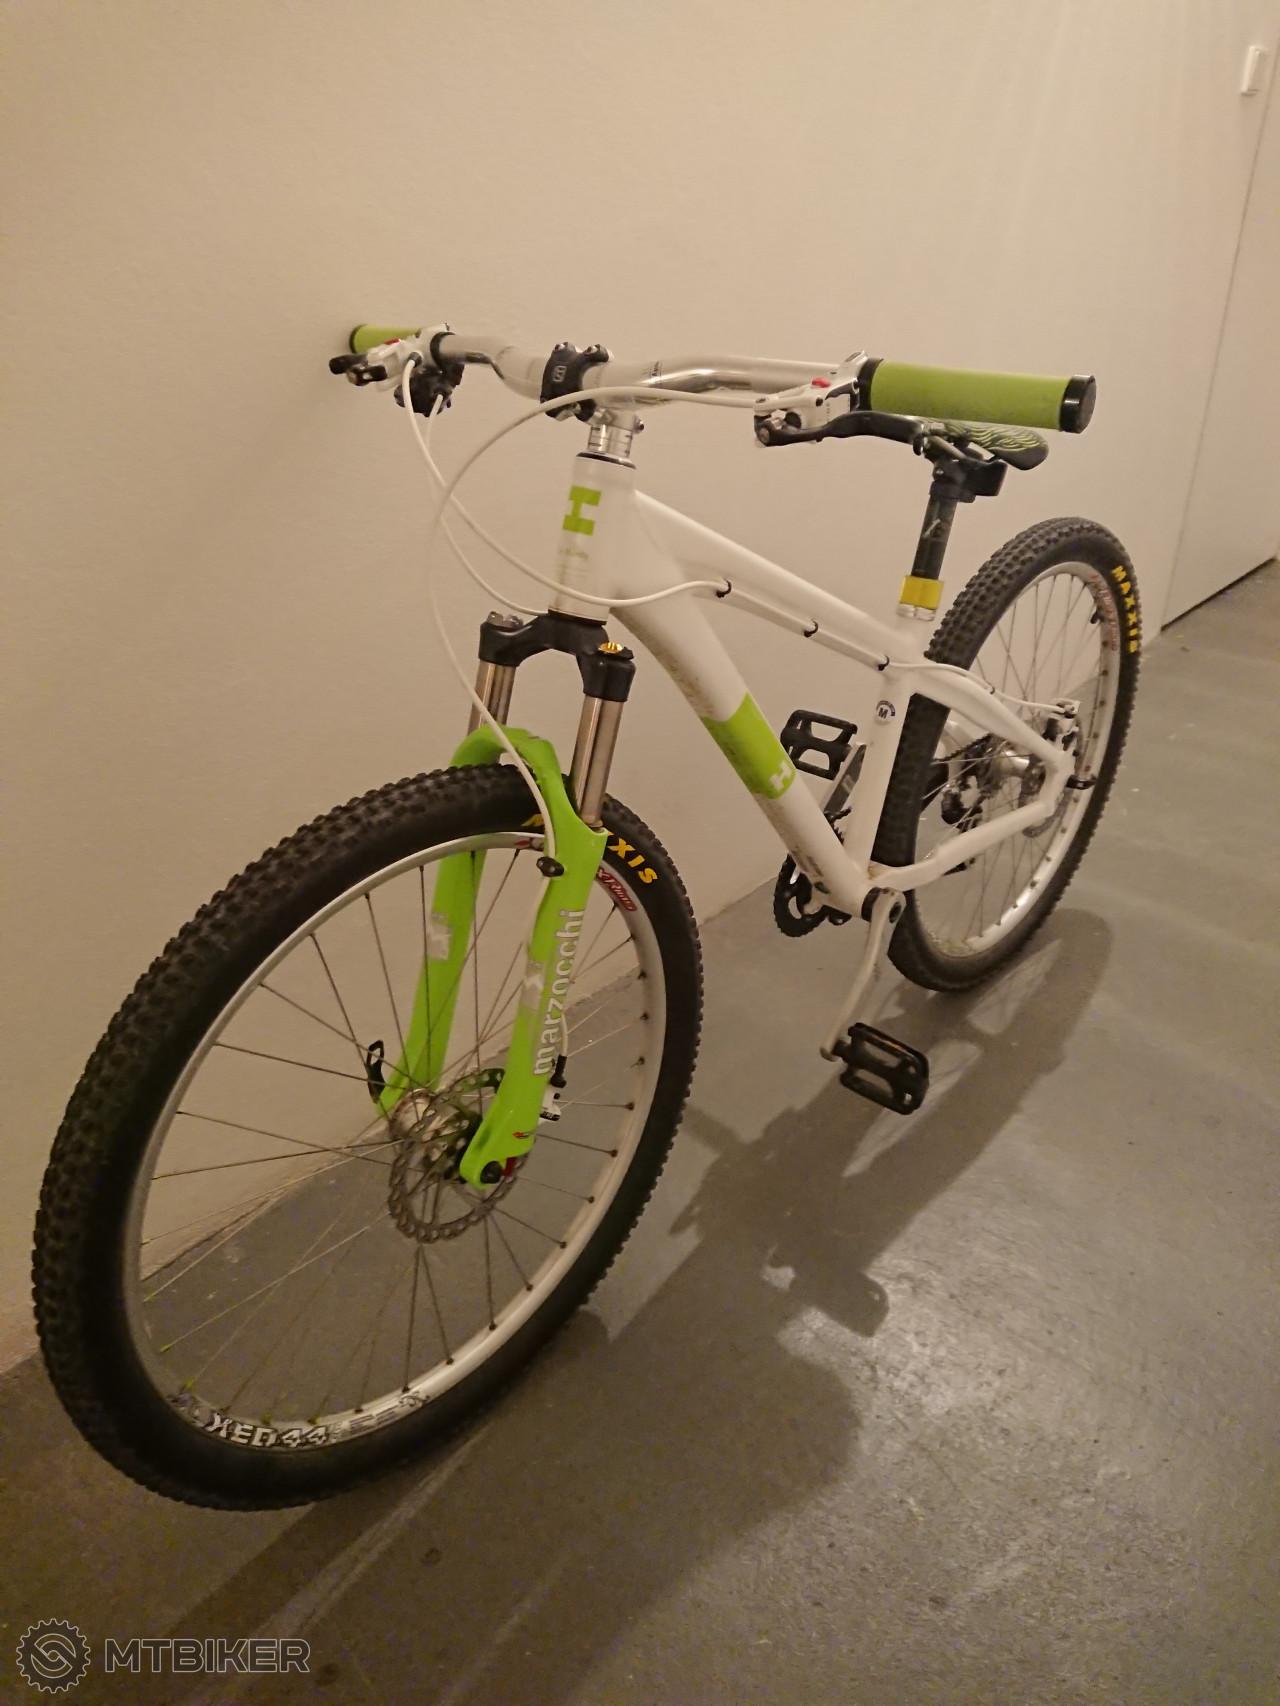 ff0c4d3b4 Bicykle - BMX, Dirt/Street - Bazár MTBIKER